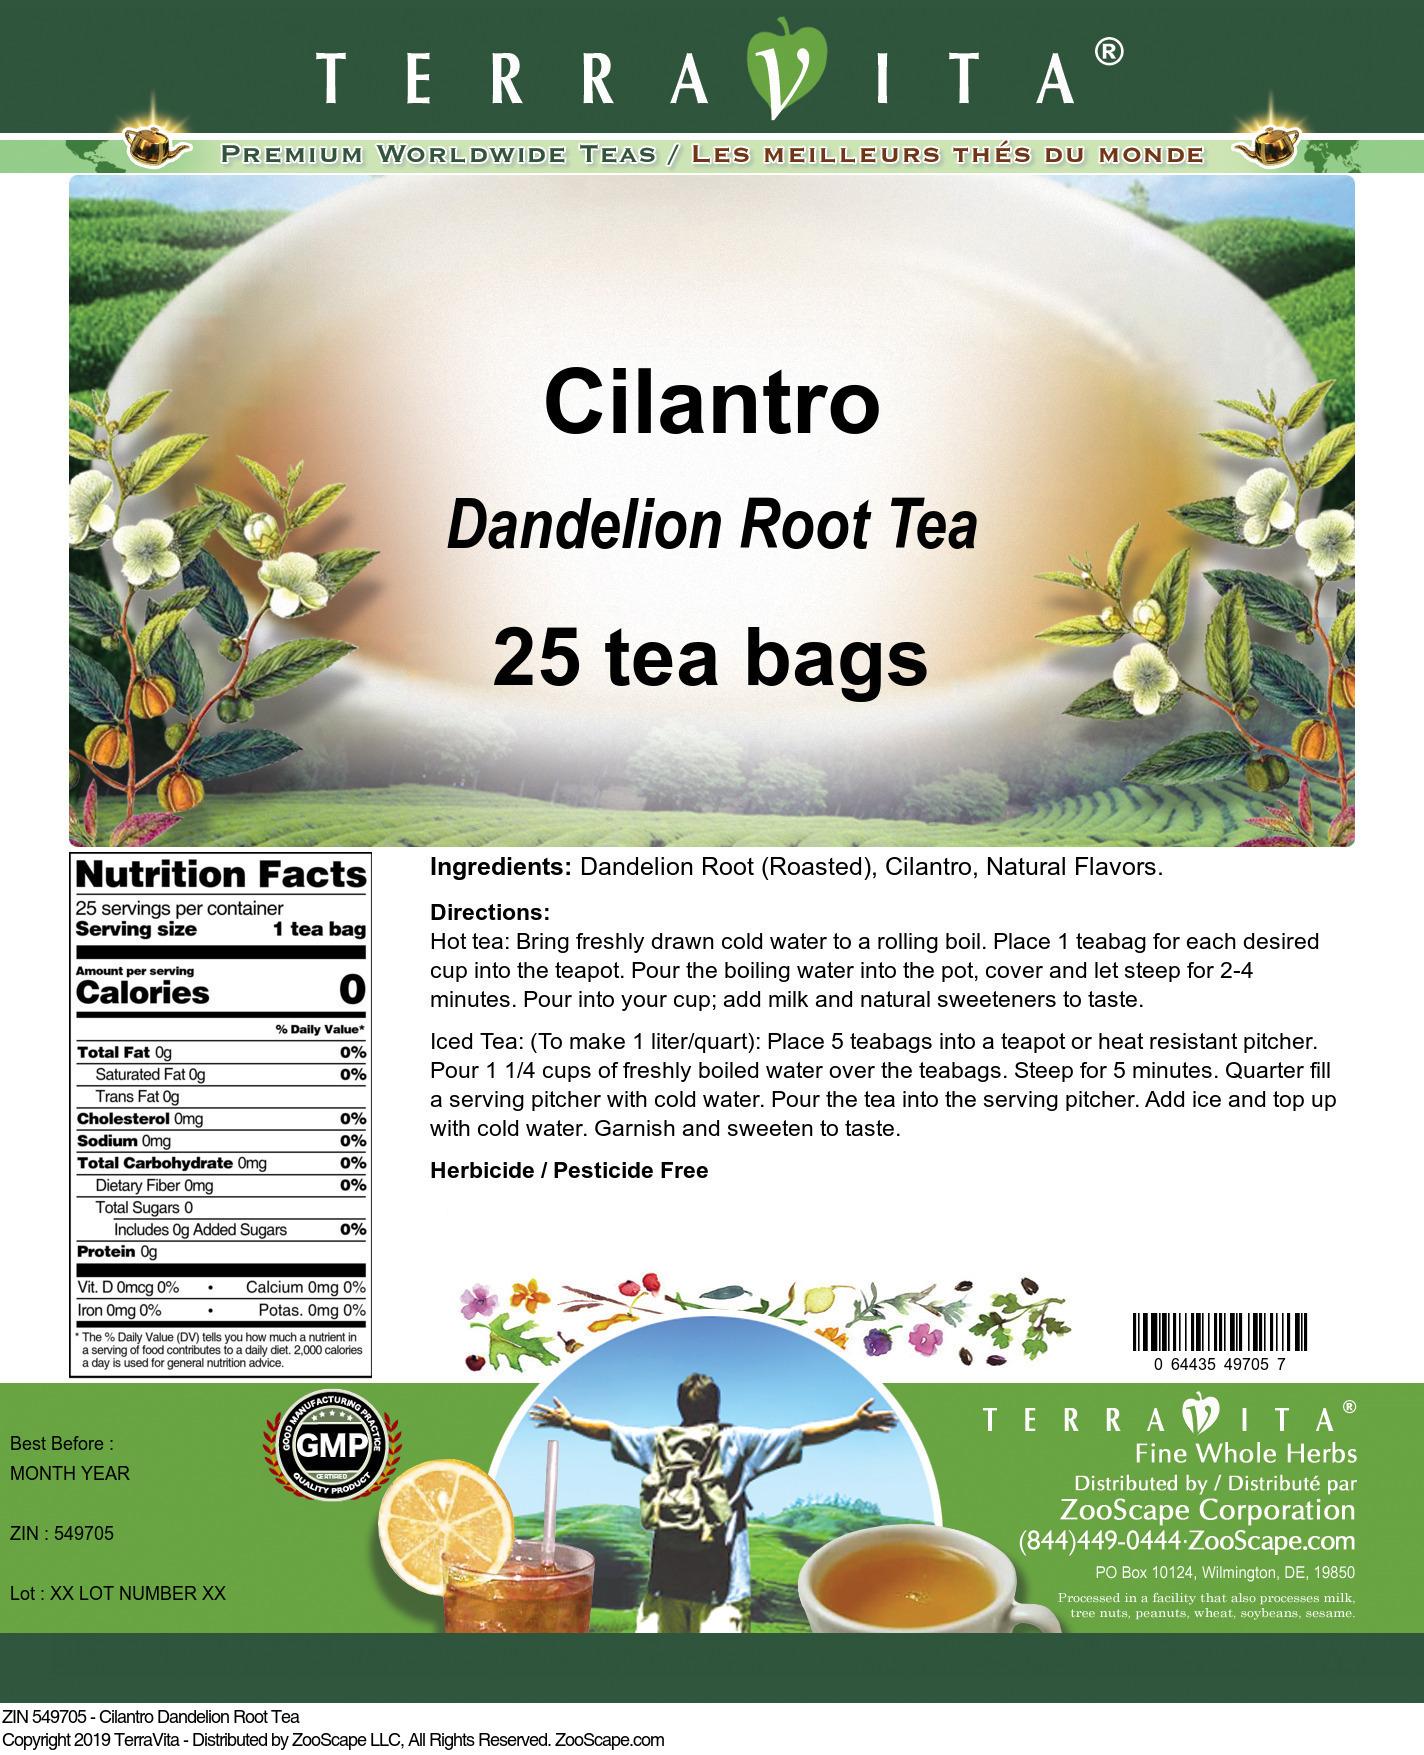 Cilantro Dandelion Root Tea